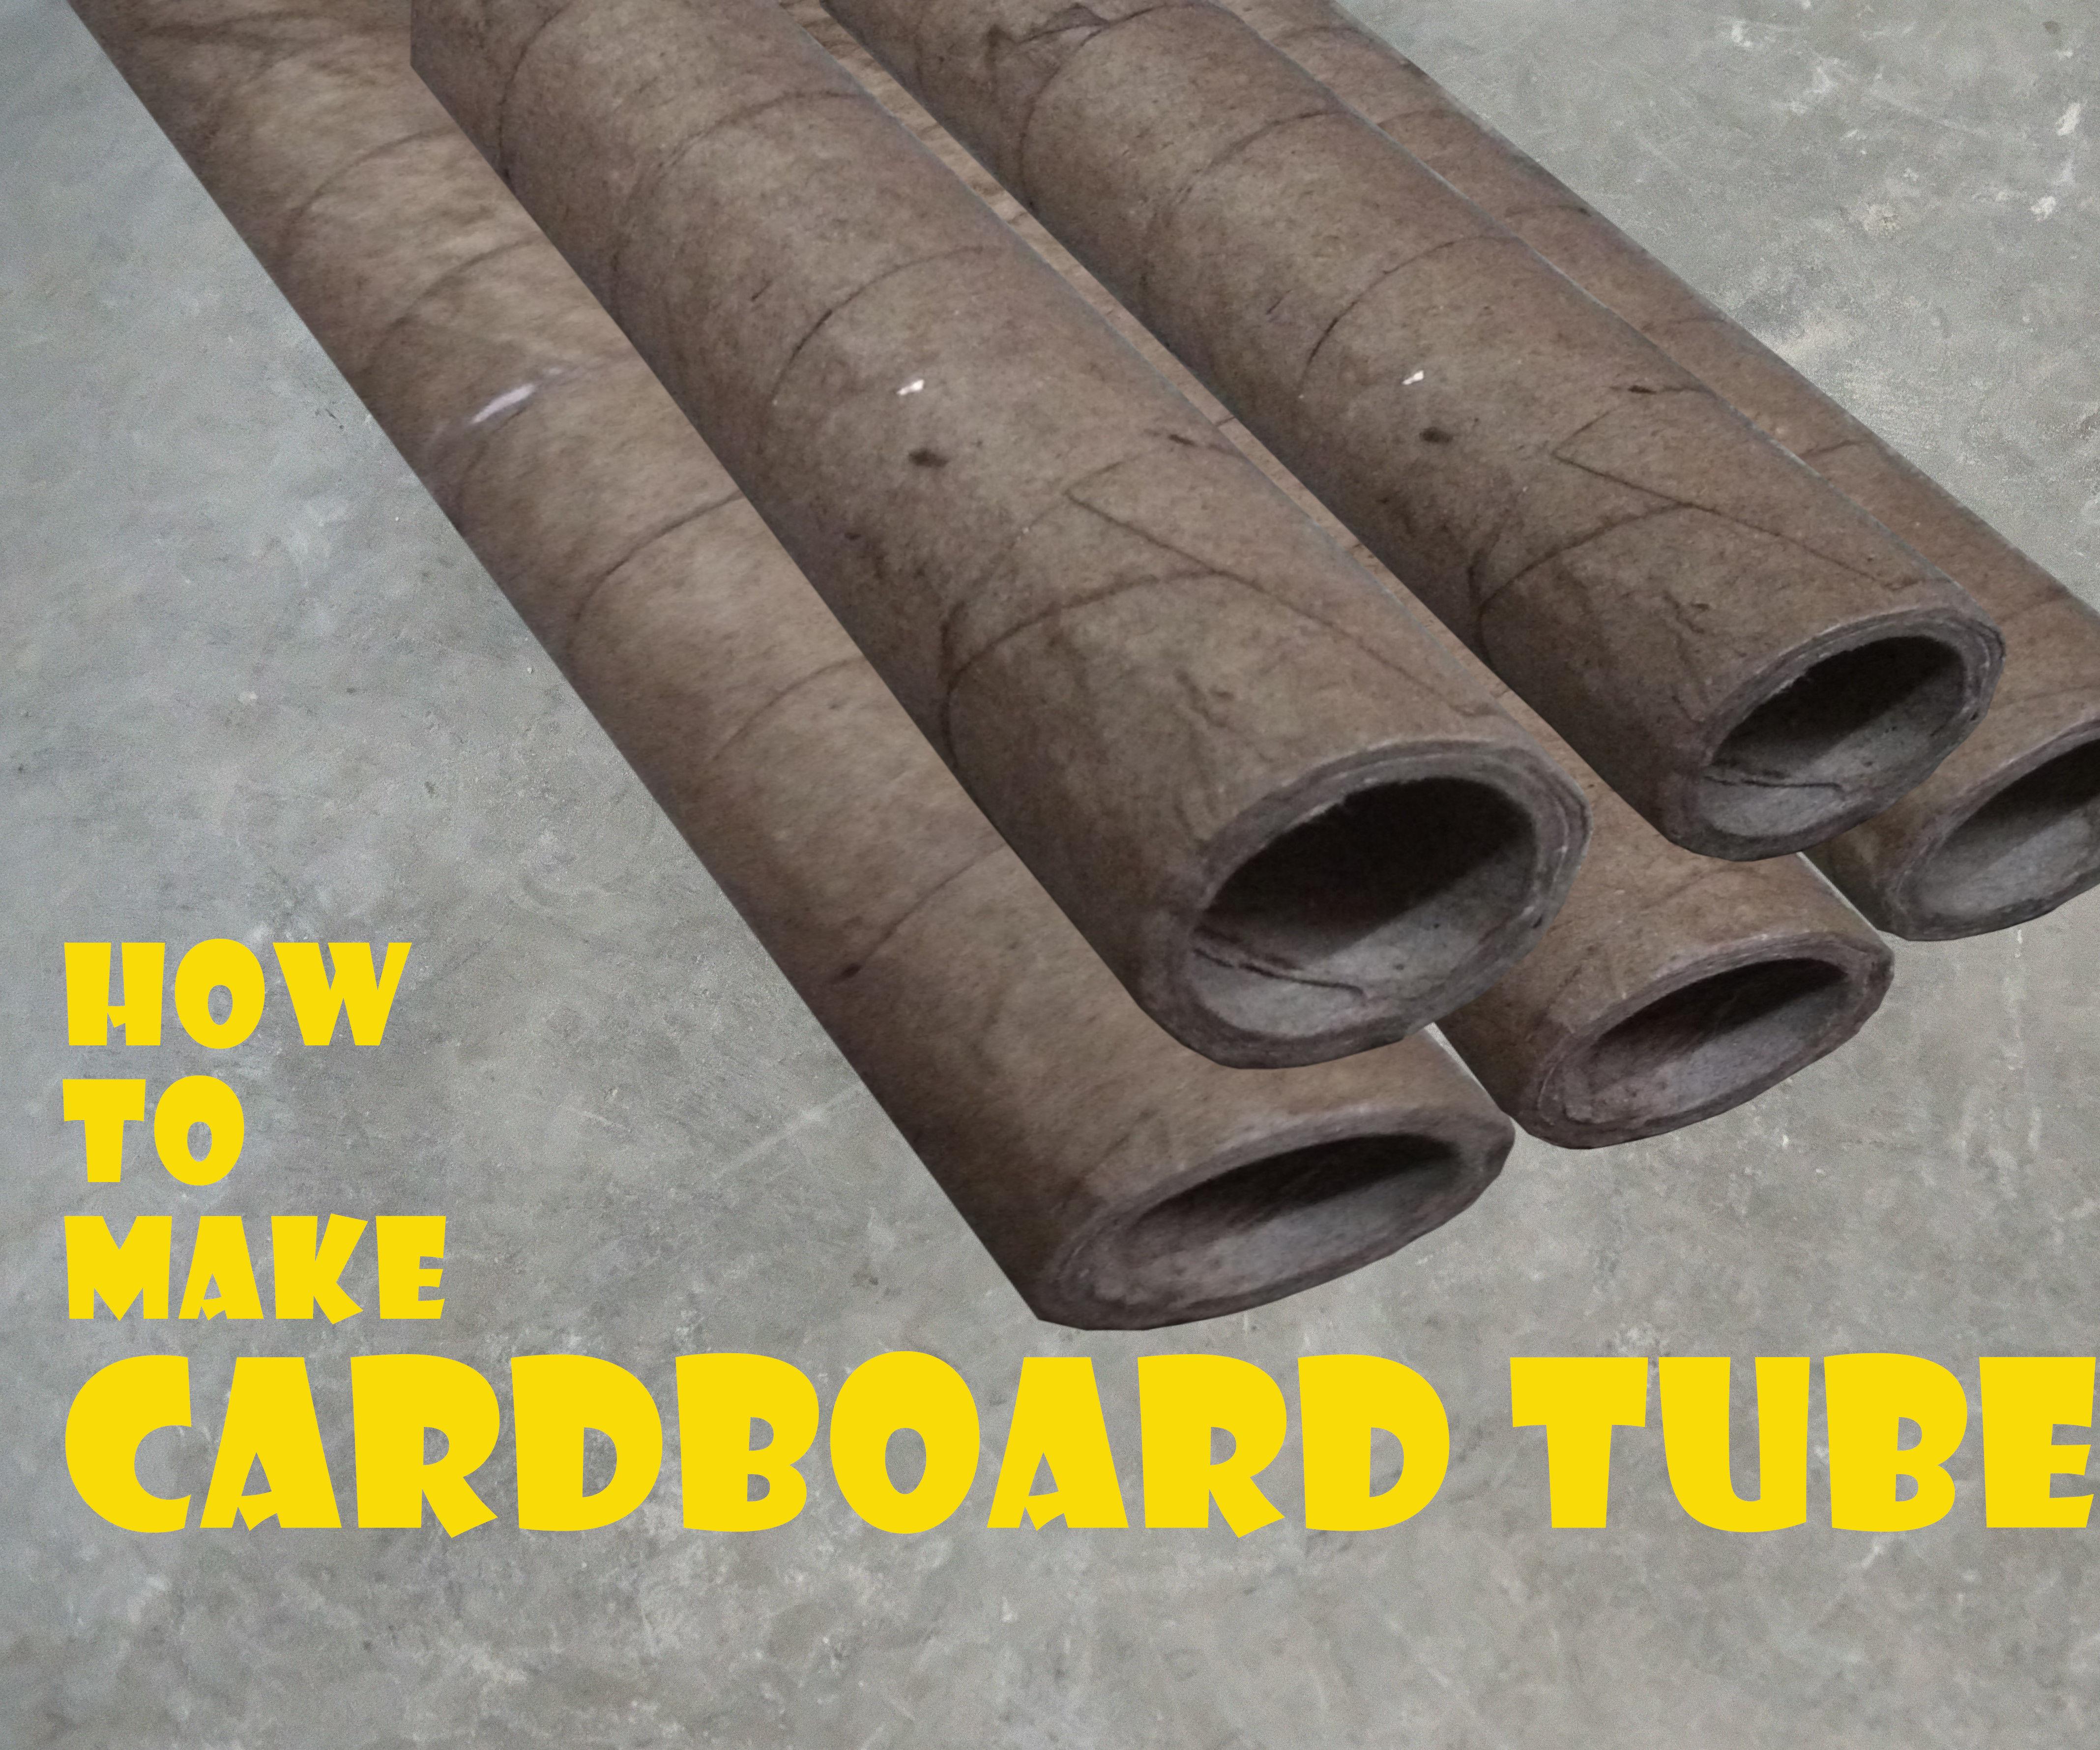 How to Make CARDBOARD TUBES